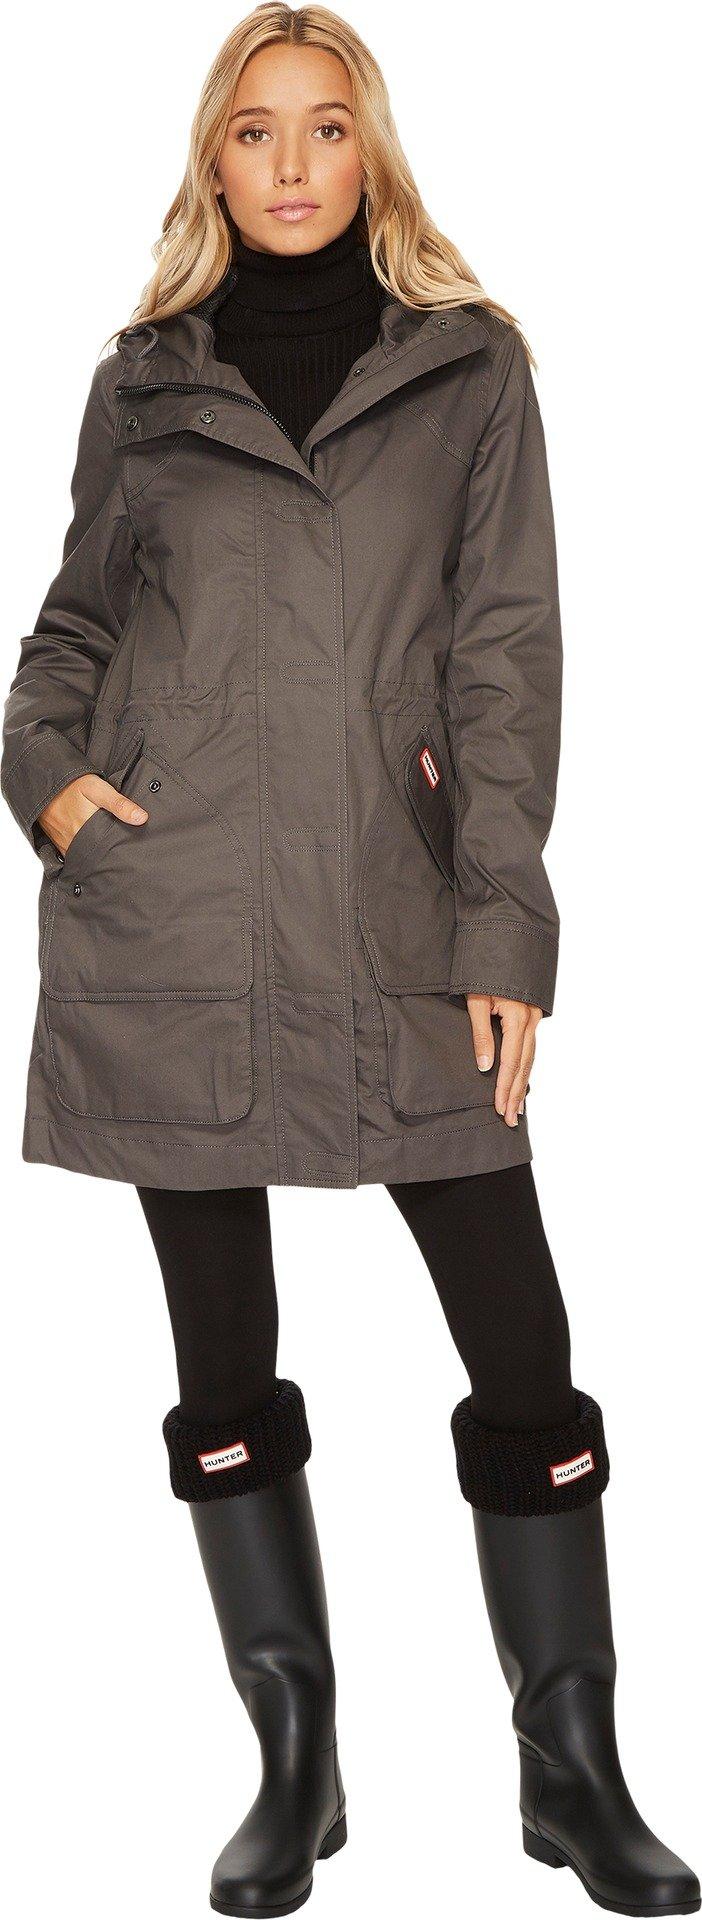 Hunter Women's Original Cotton Hunting Coat Dark Slate Outerwear